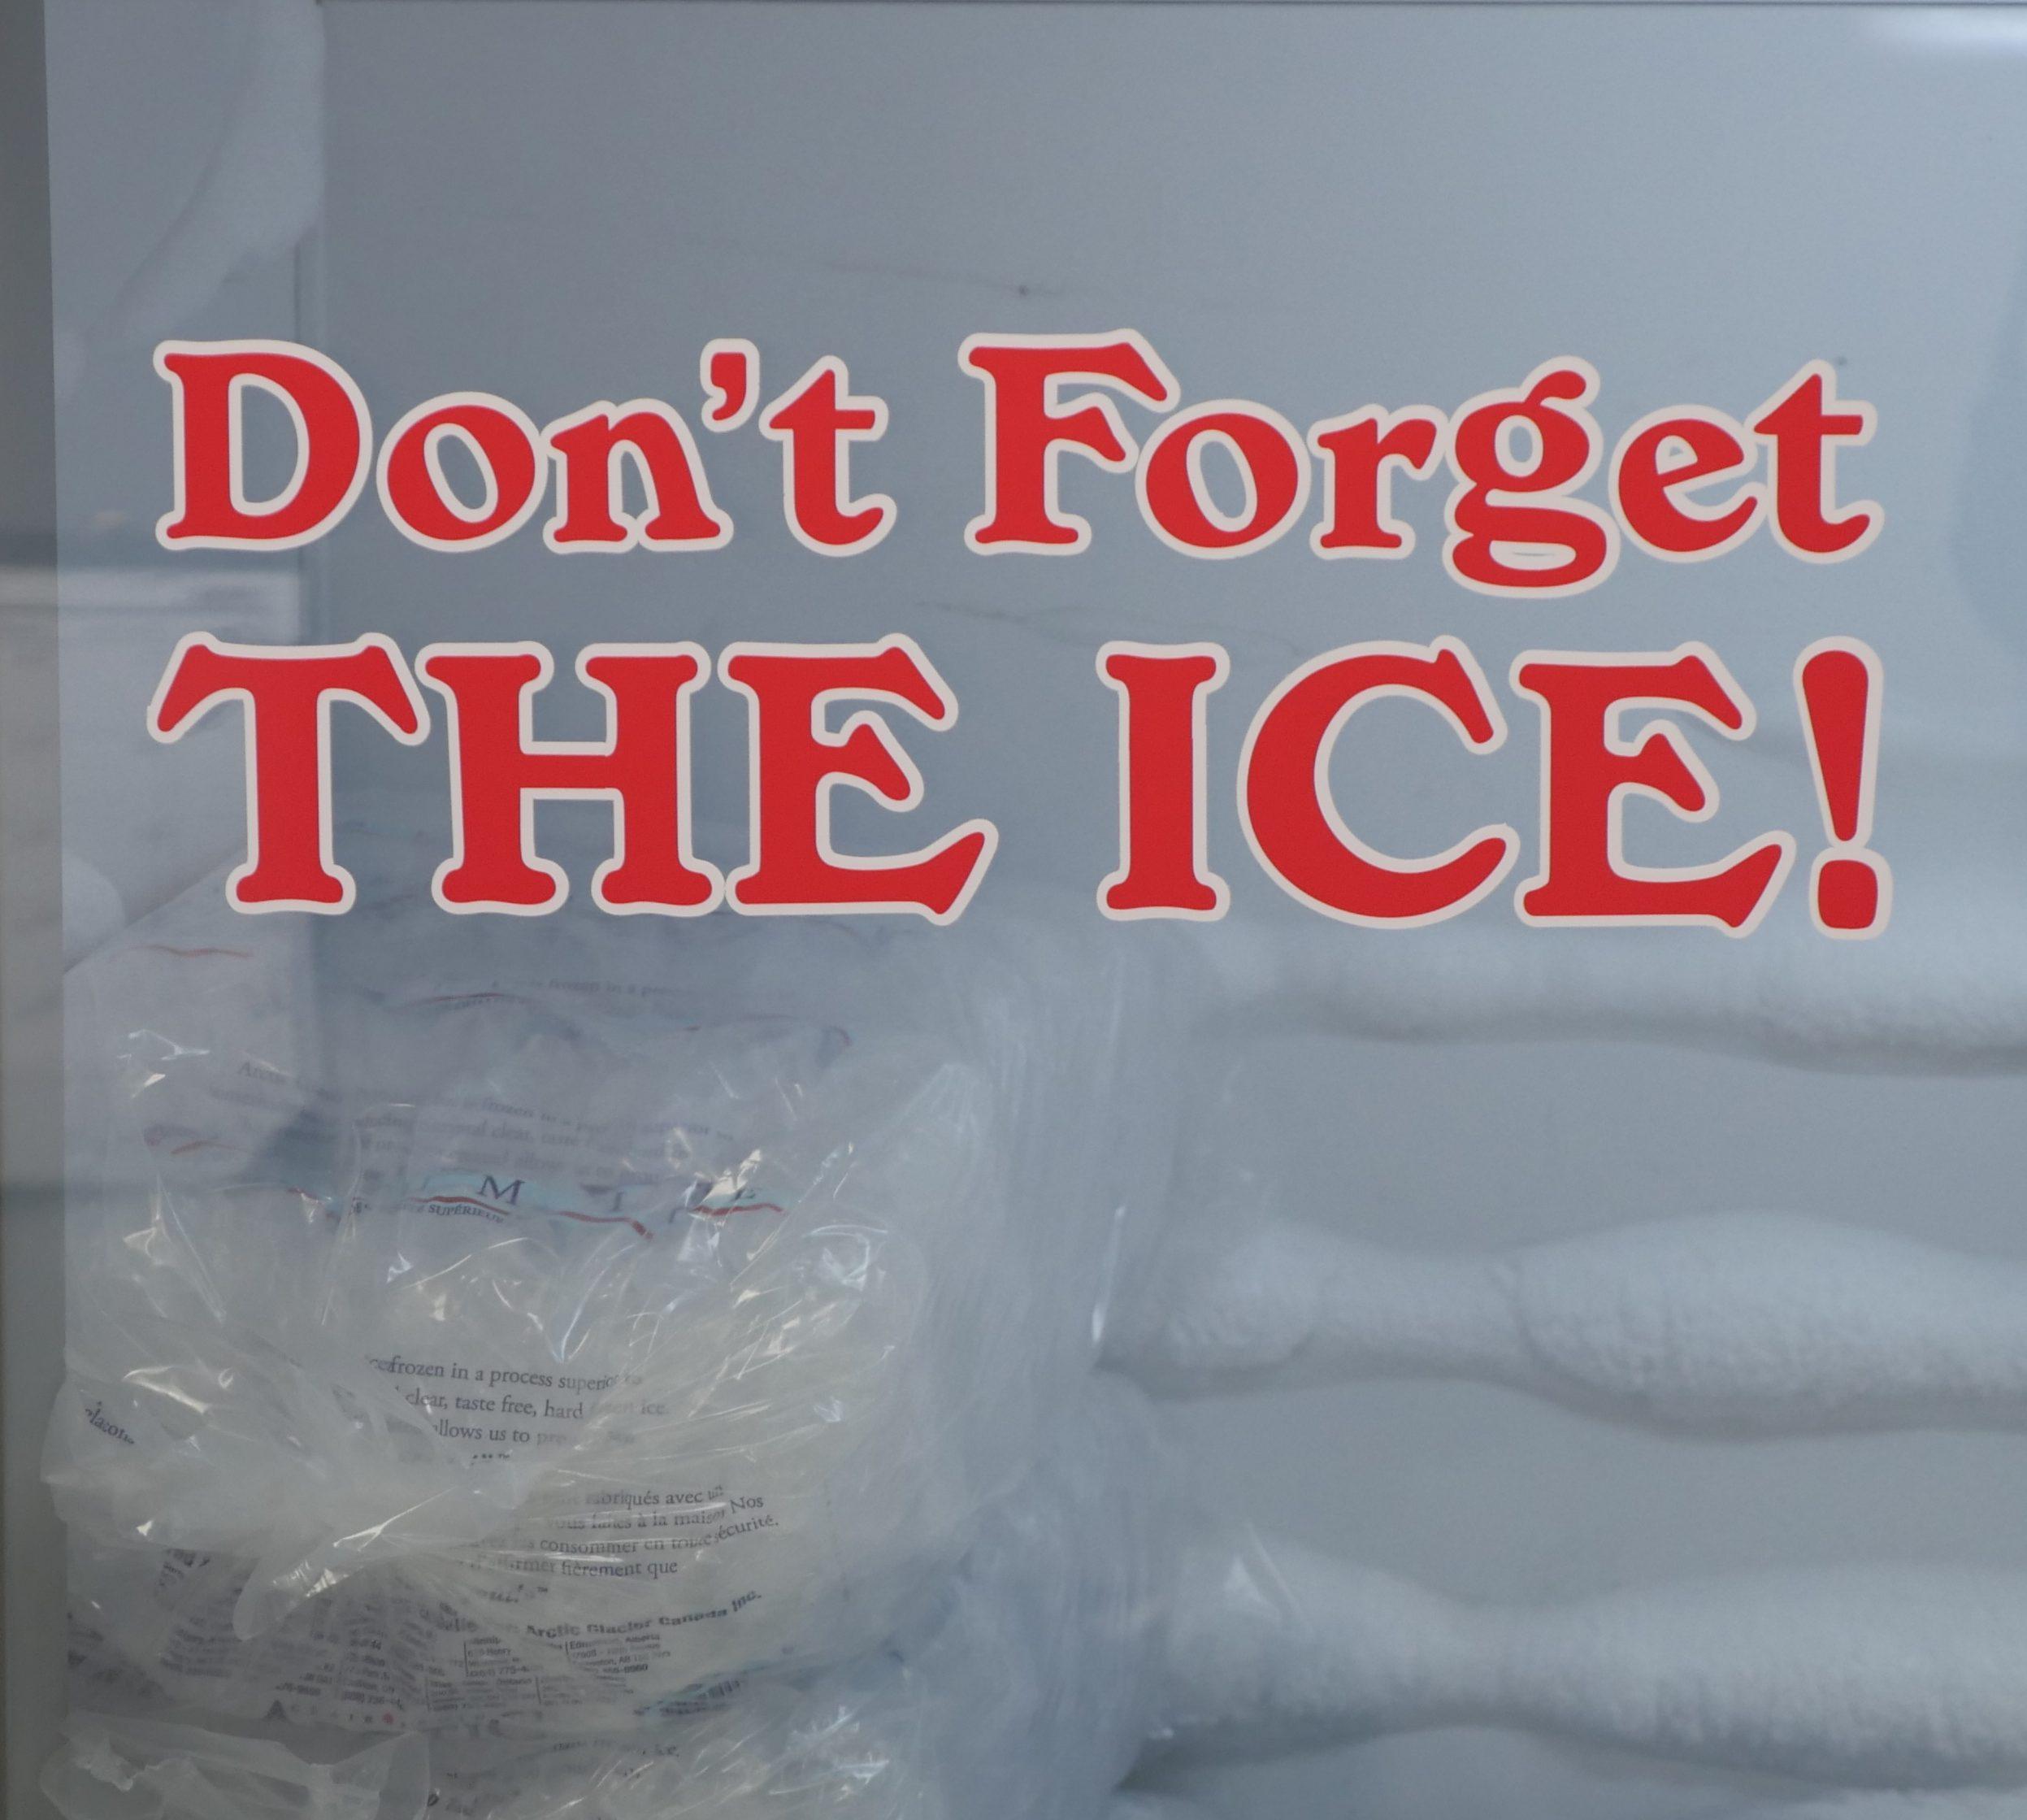 RJS ice regina